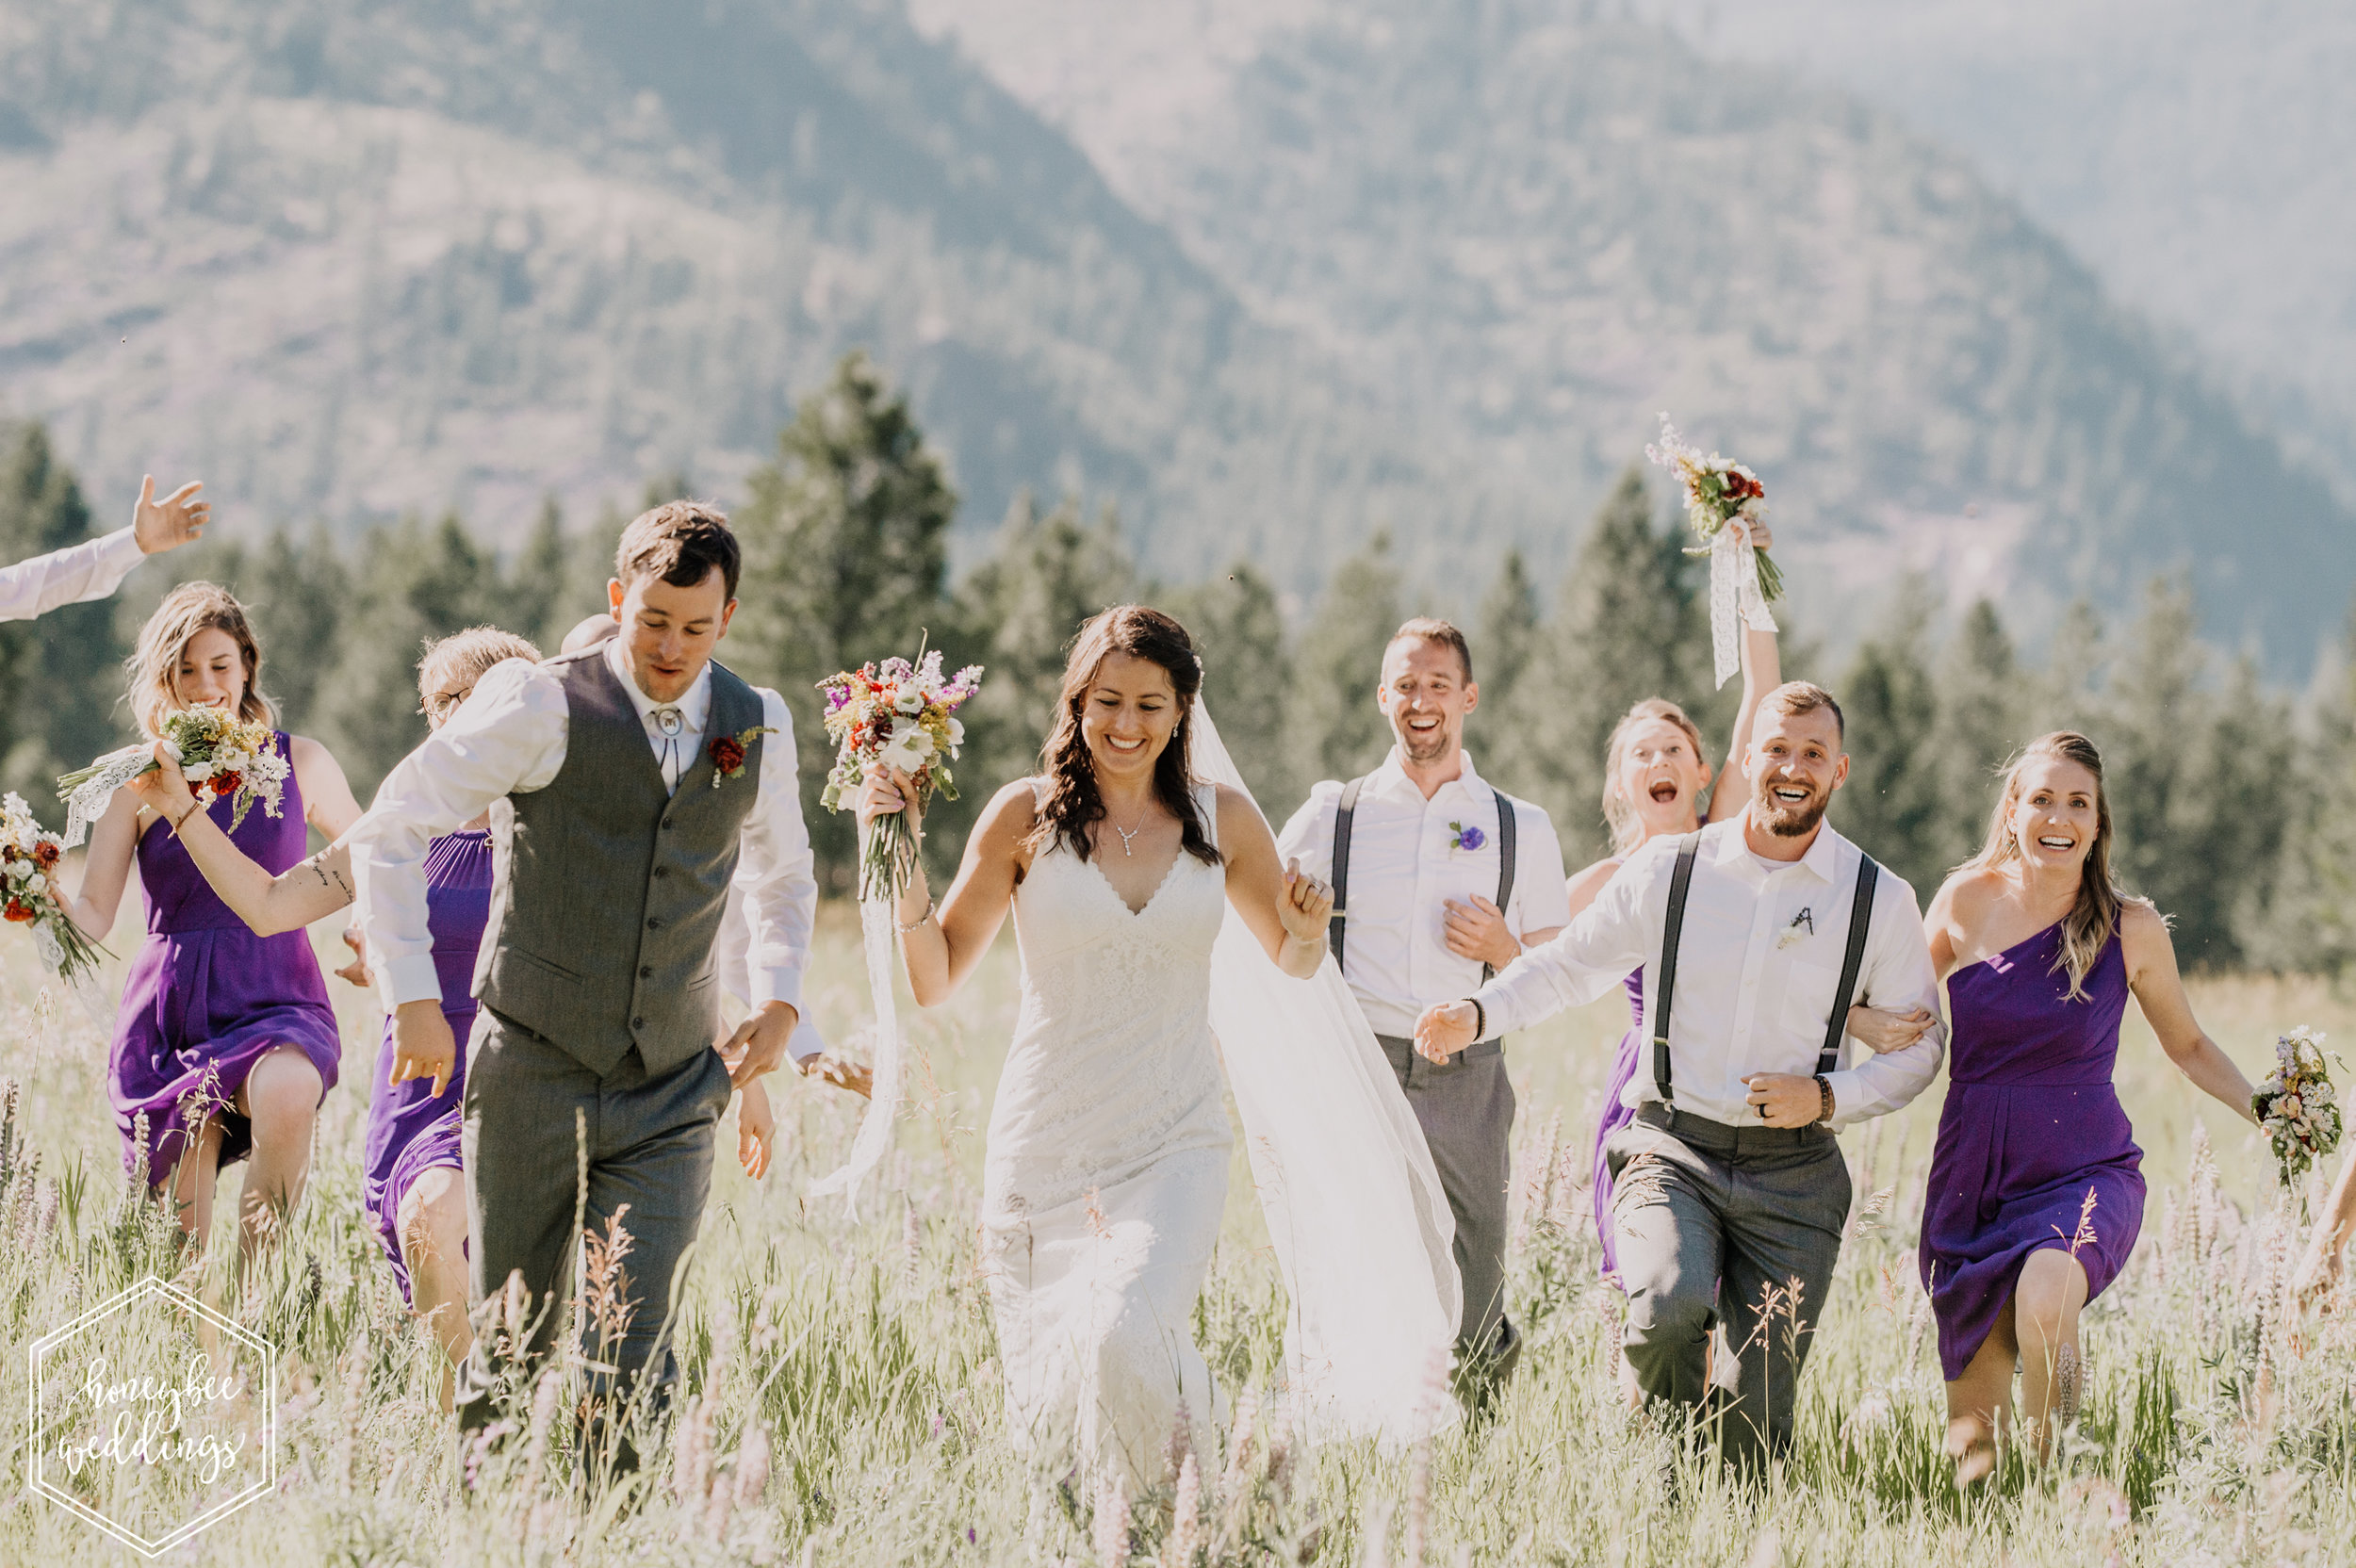 412 White Raven Wedding_Montana Wedding Photographer_Honeybee Weddings_ Meghan Maloney + Arza Hammond 2018-8893.jpg